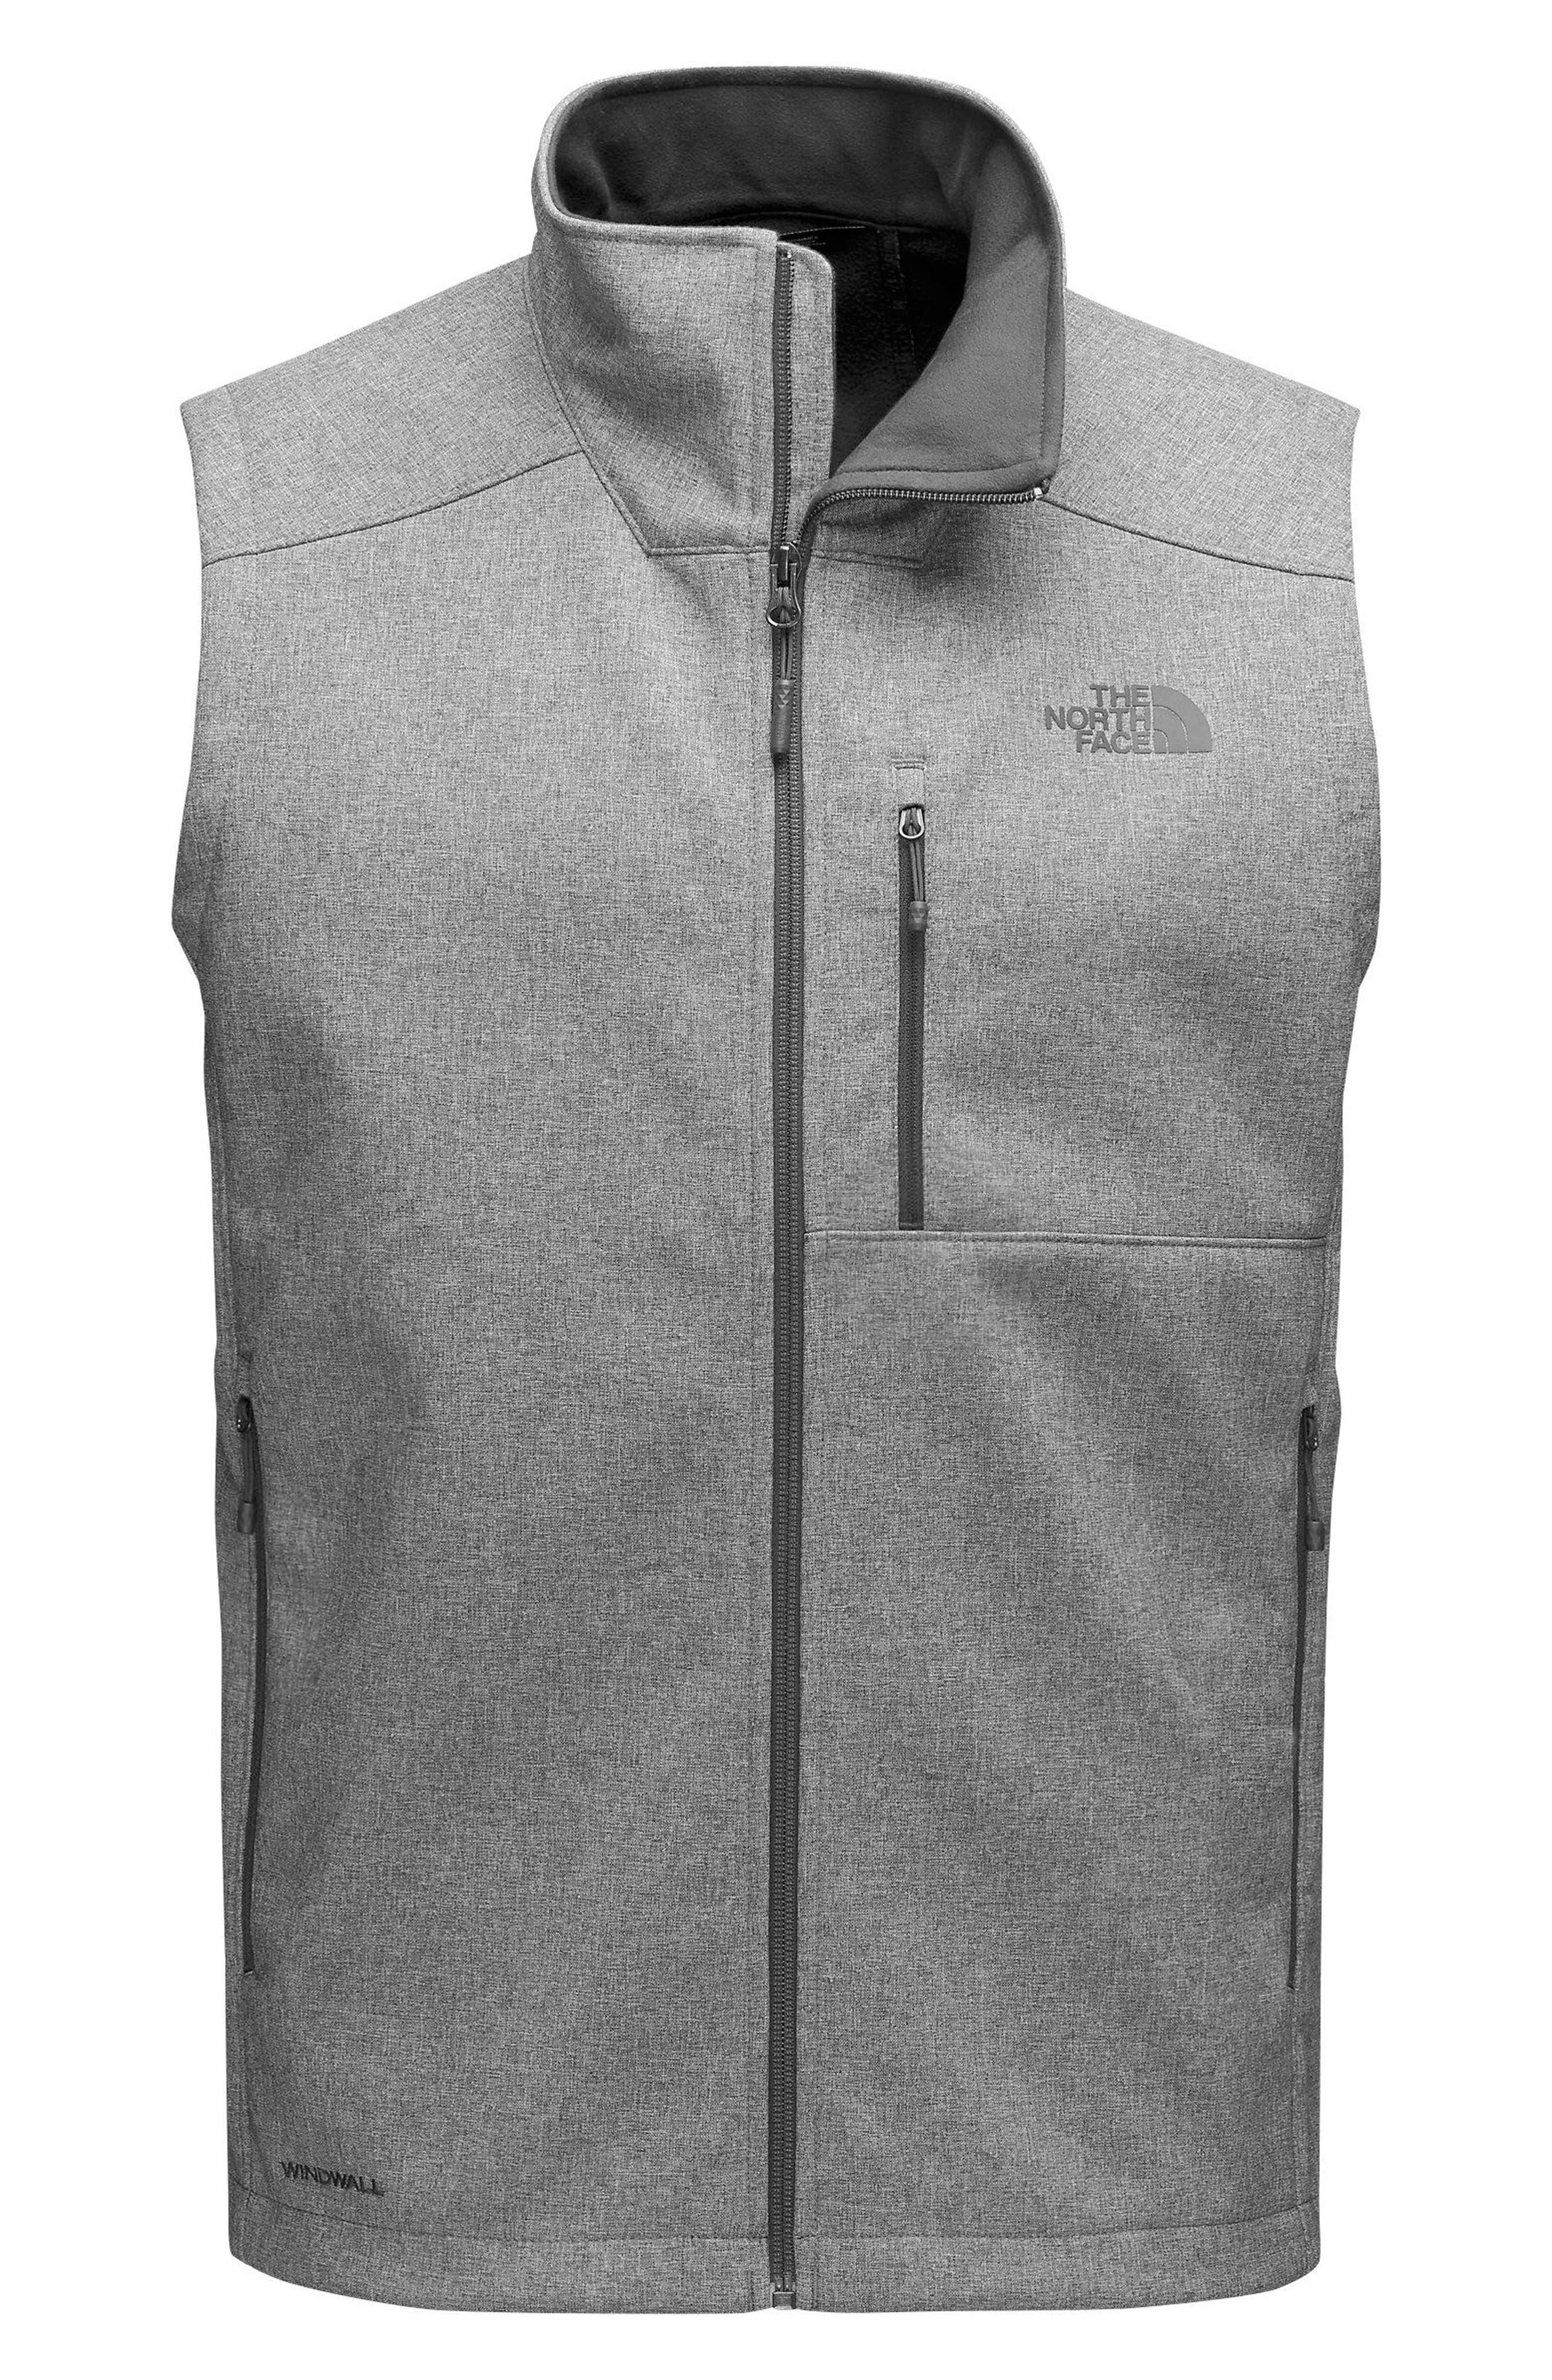 Apex Bionic 2 Vest,                         Main,                         color, Tnf Medium Grey Heather